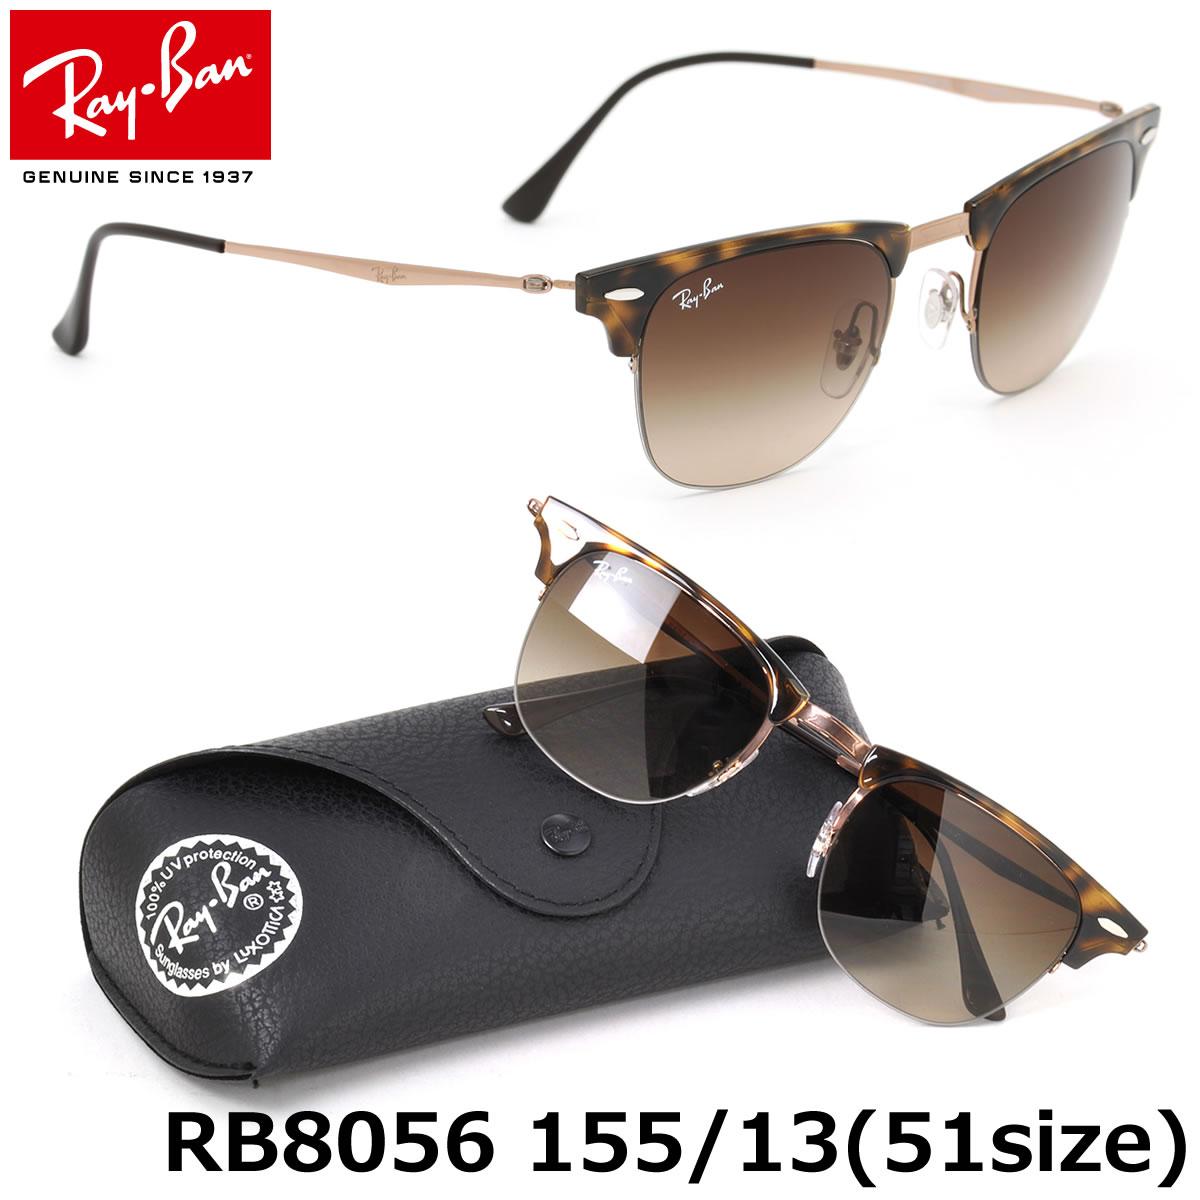 8f5e0f0e115 Ray-Ban Sunglasses RB8056 155 13 51size TECH CLUBMASTER LIGHT RAY GENUINE  NEW rayban ray ban